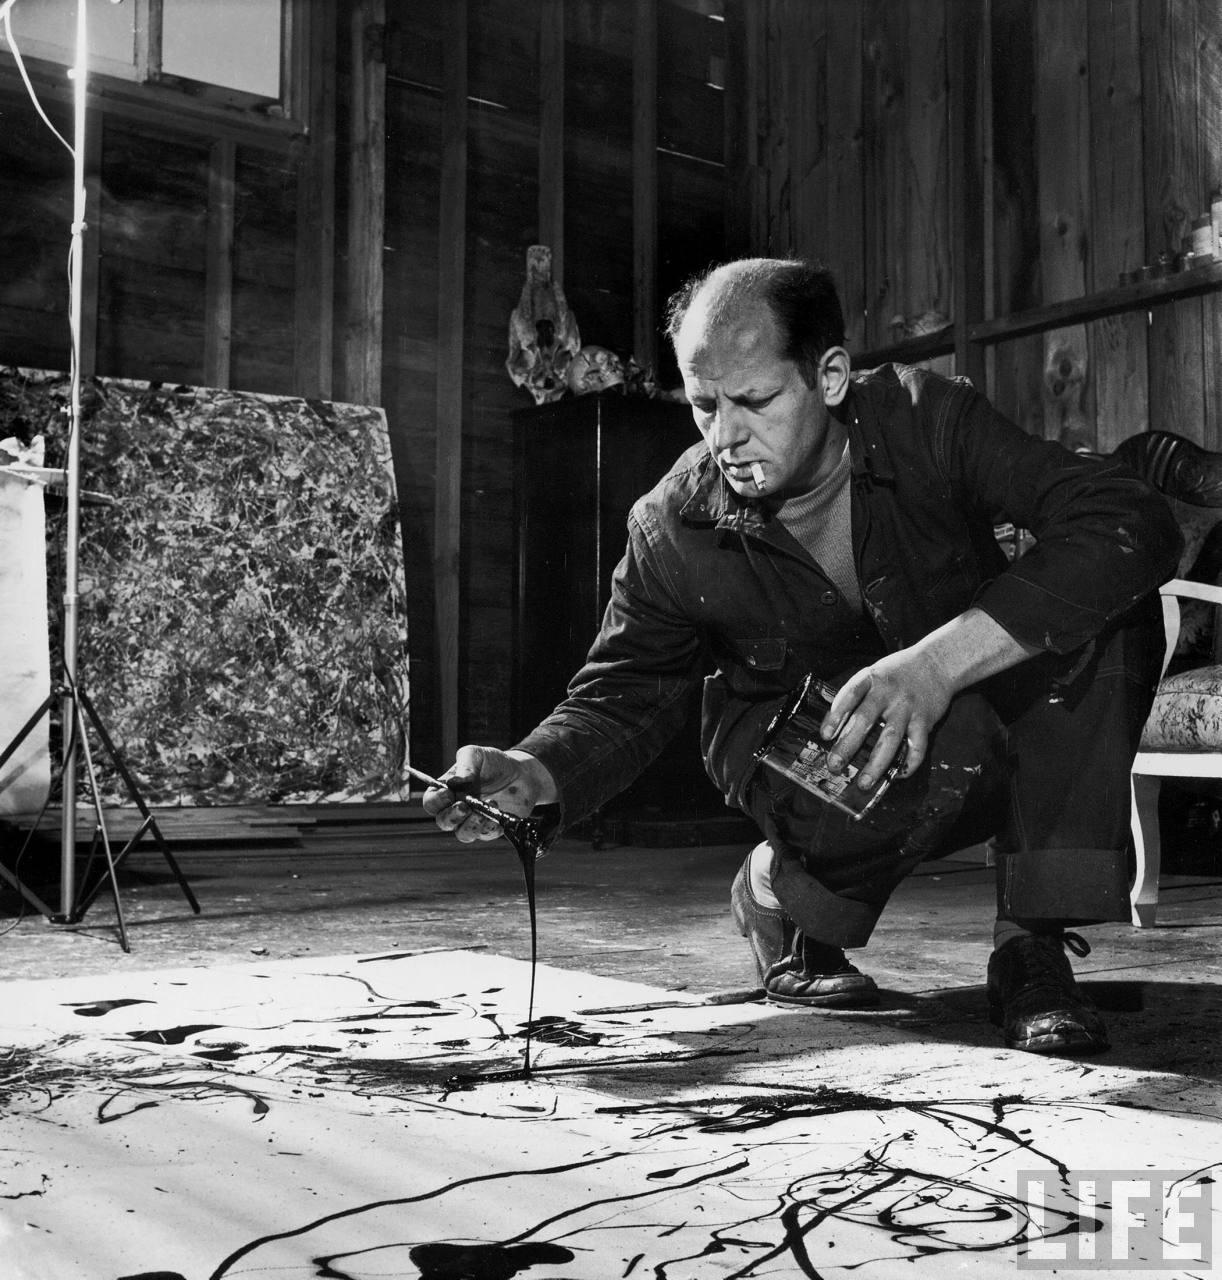 Jackson Pollock at work, image by Life Magazine